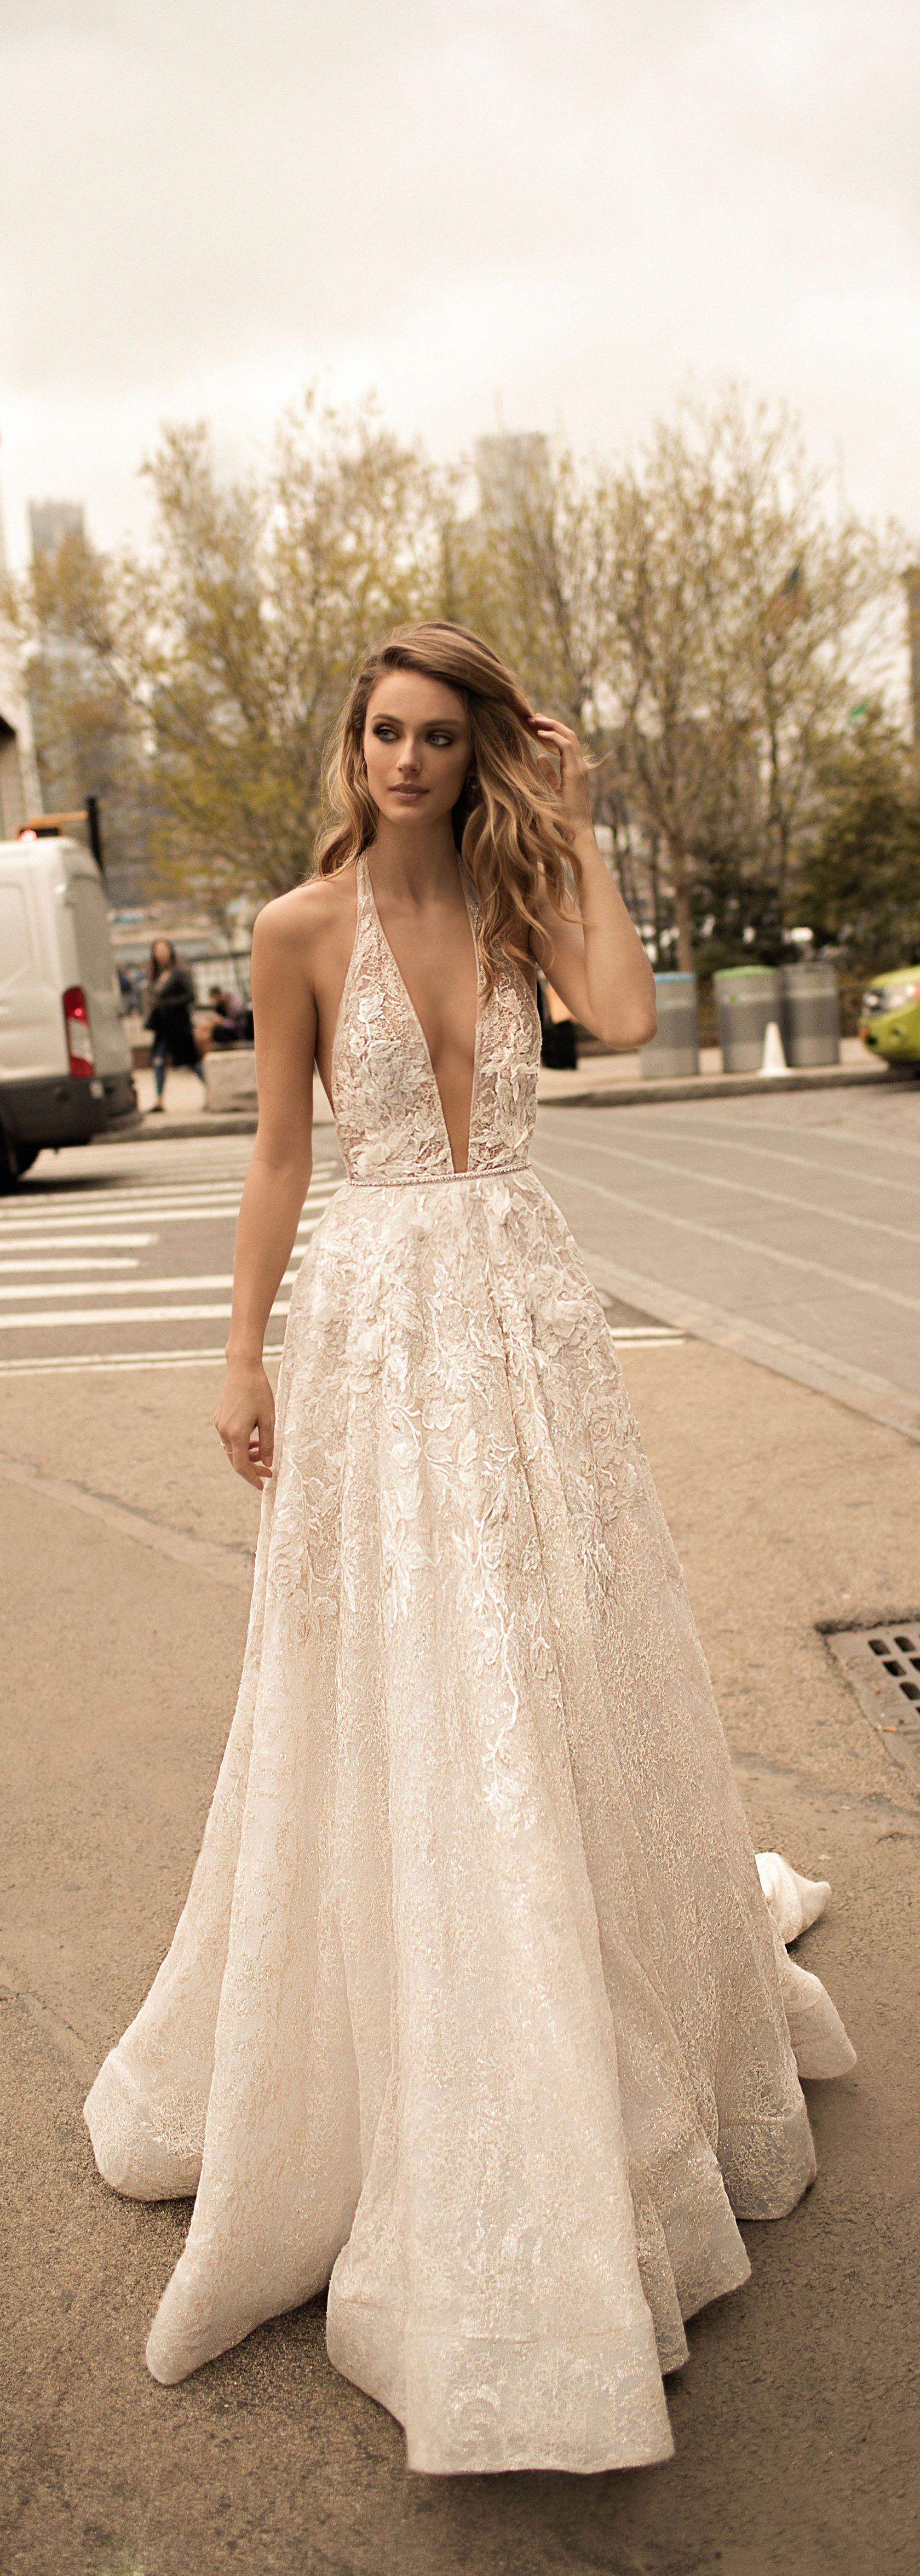 1a86795028c BERTA style 18-01 AKA the Elena dress. BERTA 2018.